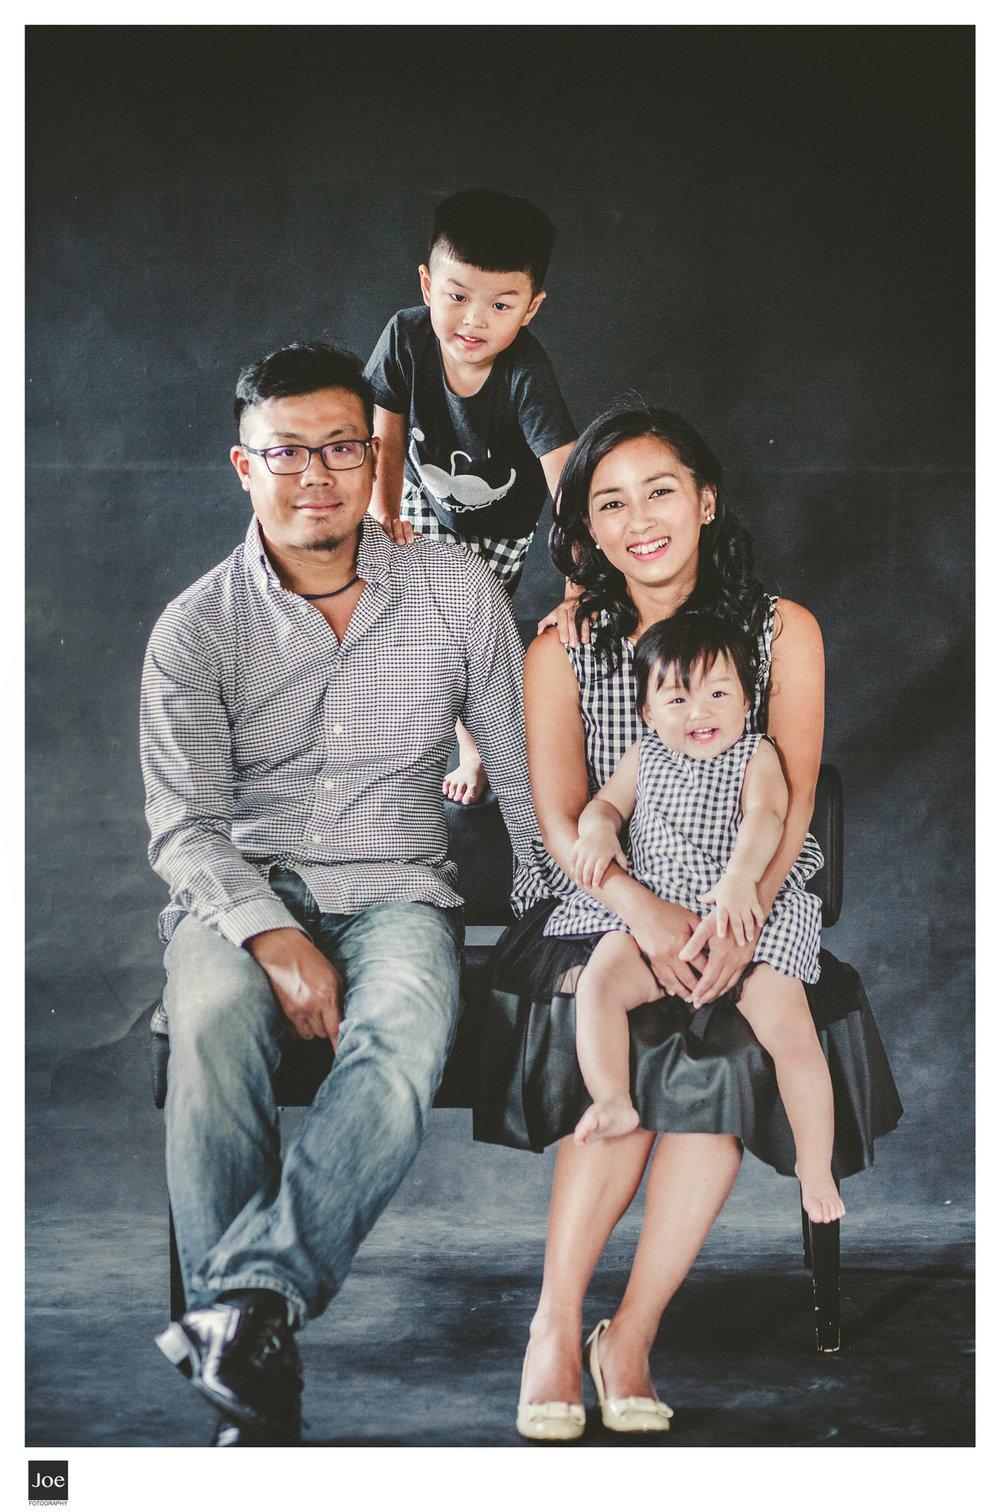 joe-fotography-family-photo-pepper-salt-bowtie-018.jpg